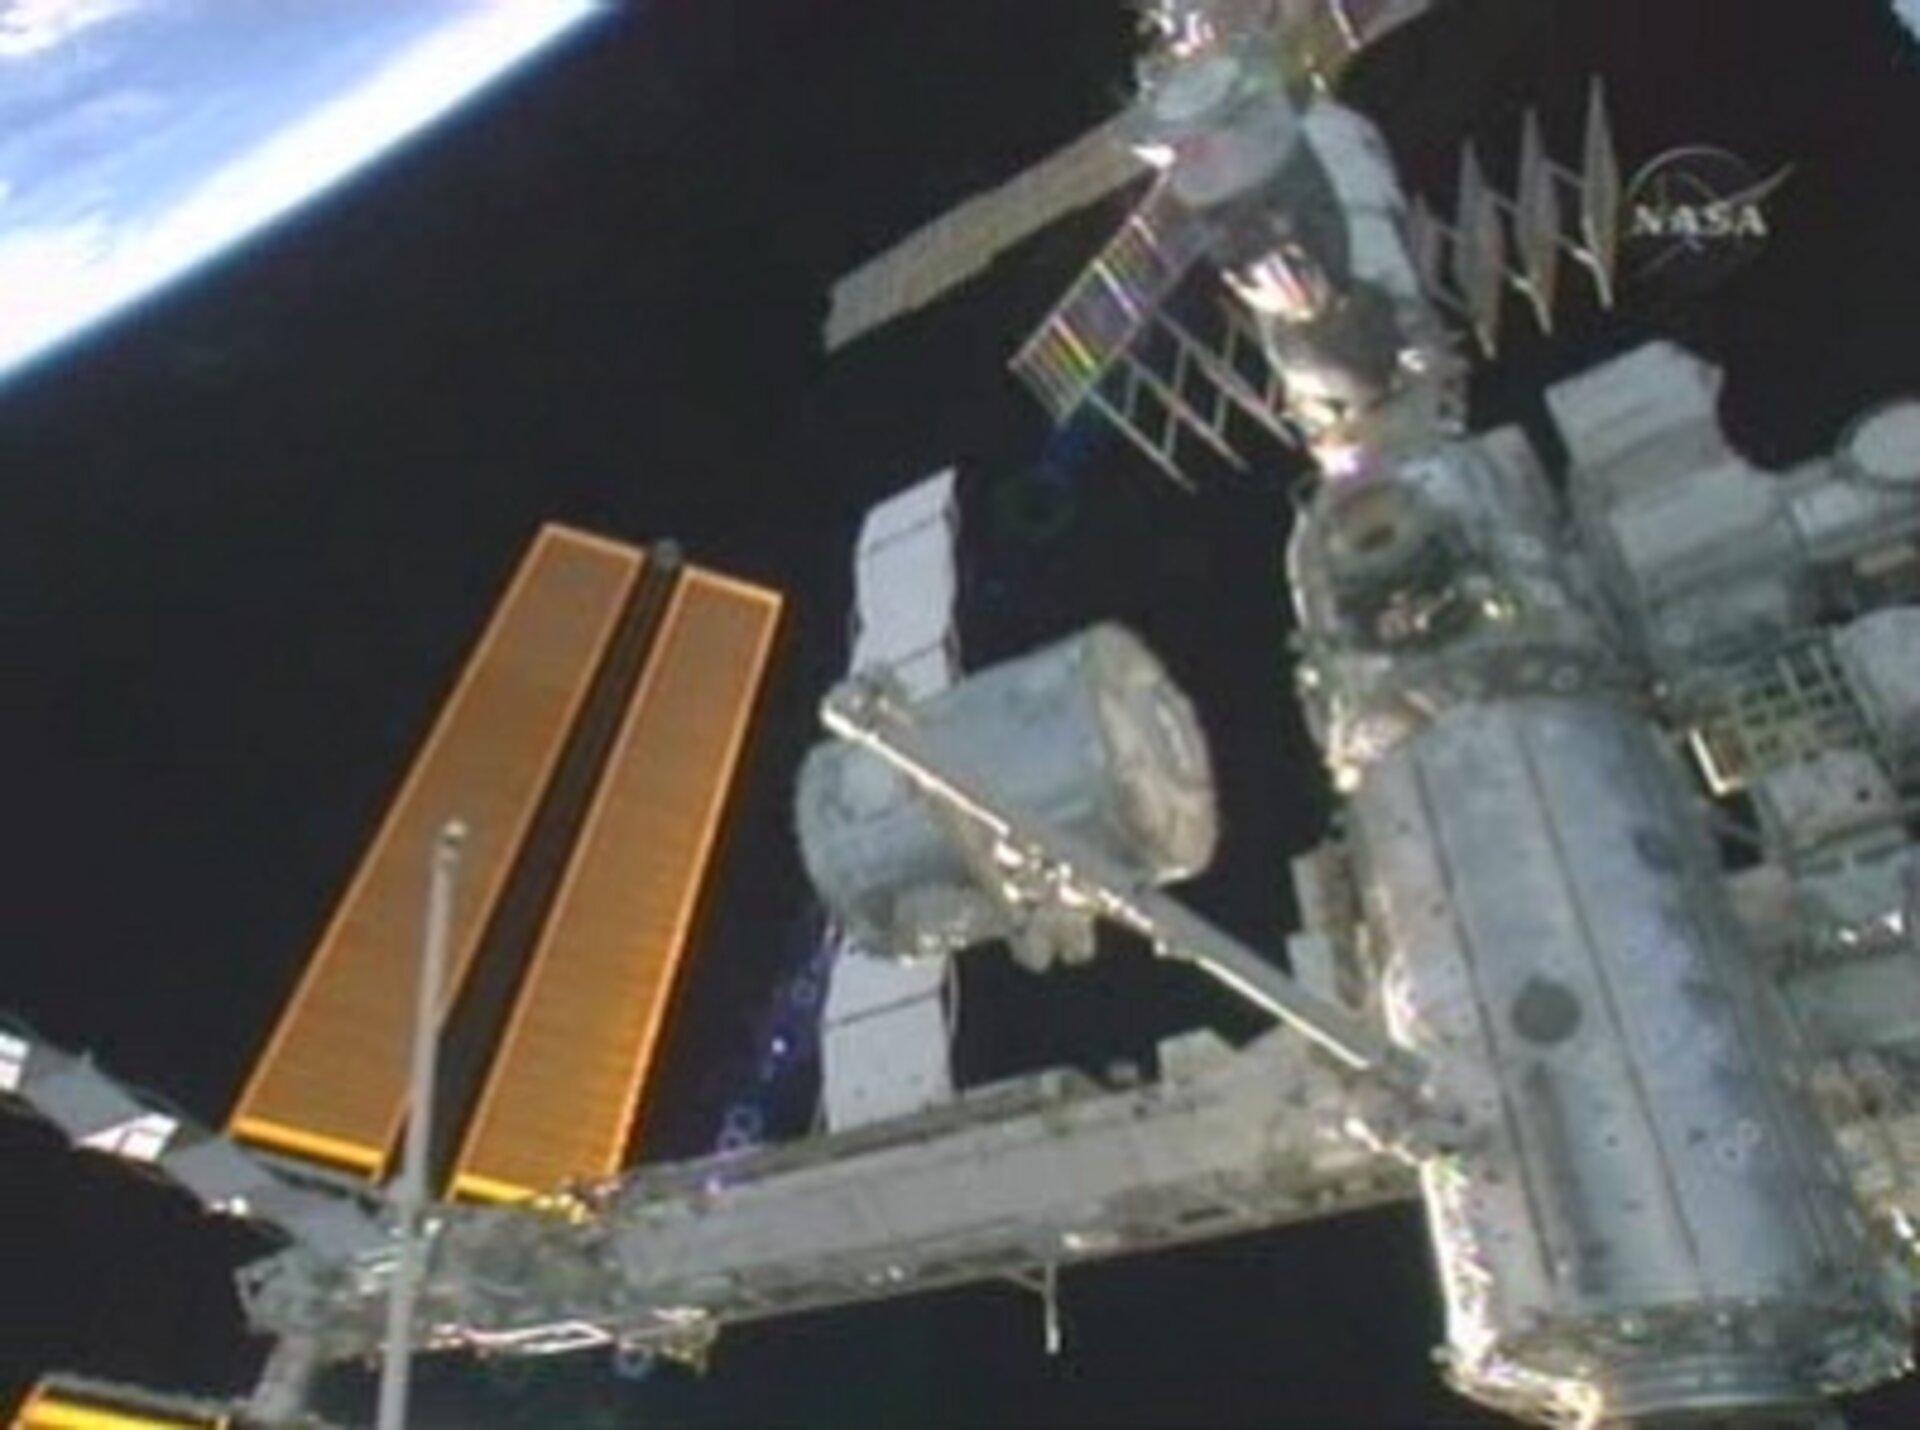 Esa Harmony Added To International Space Station